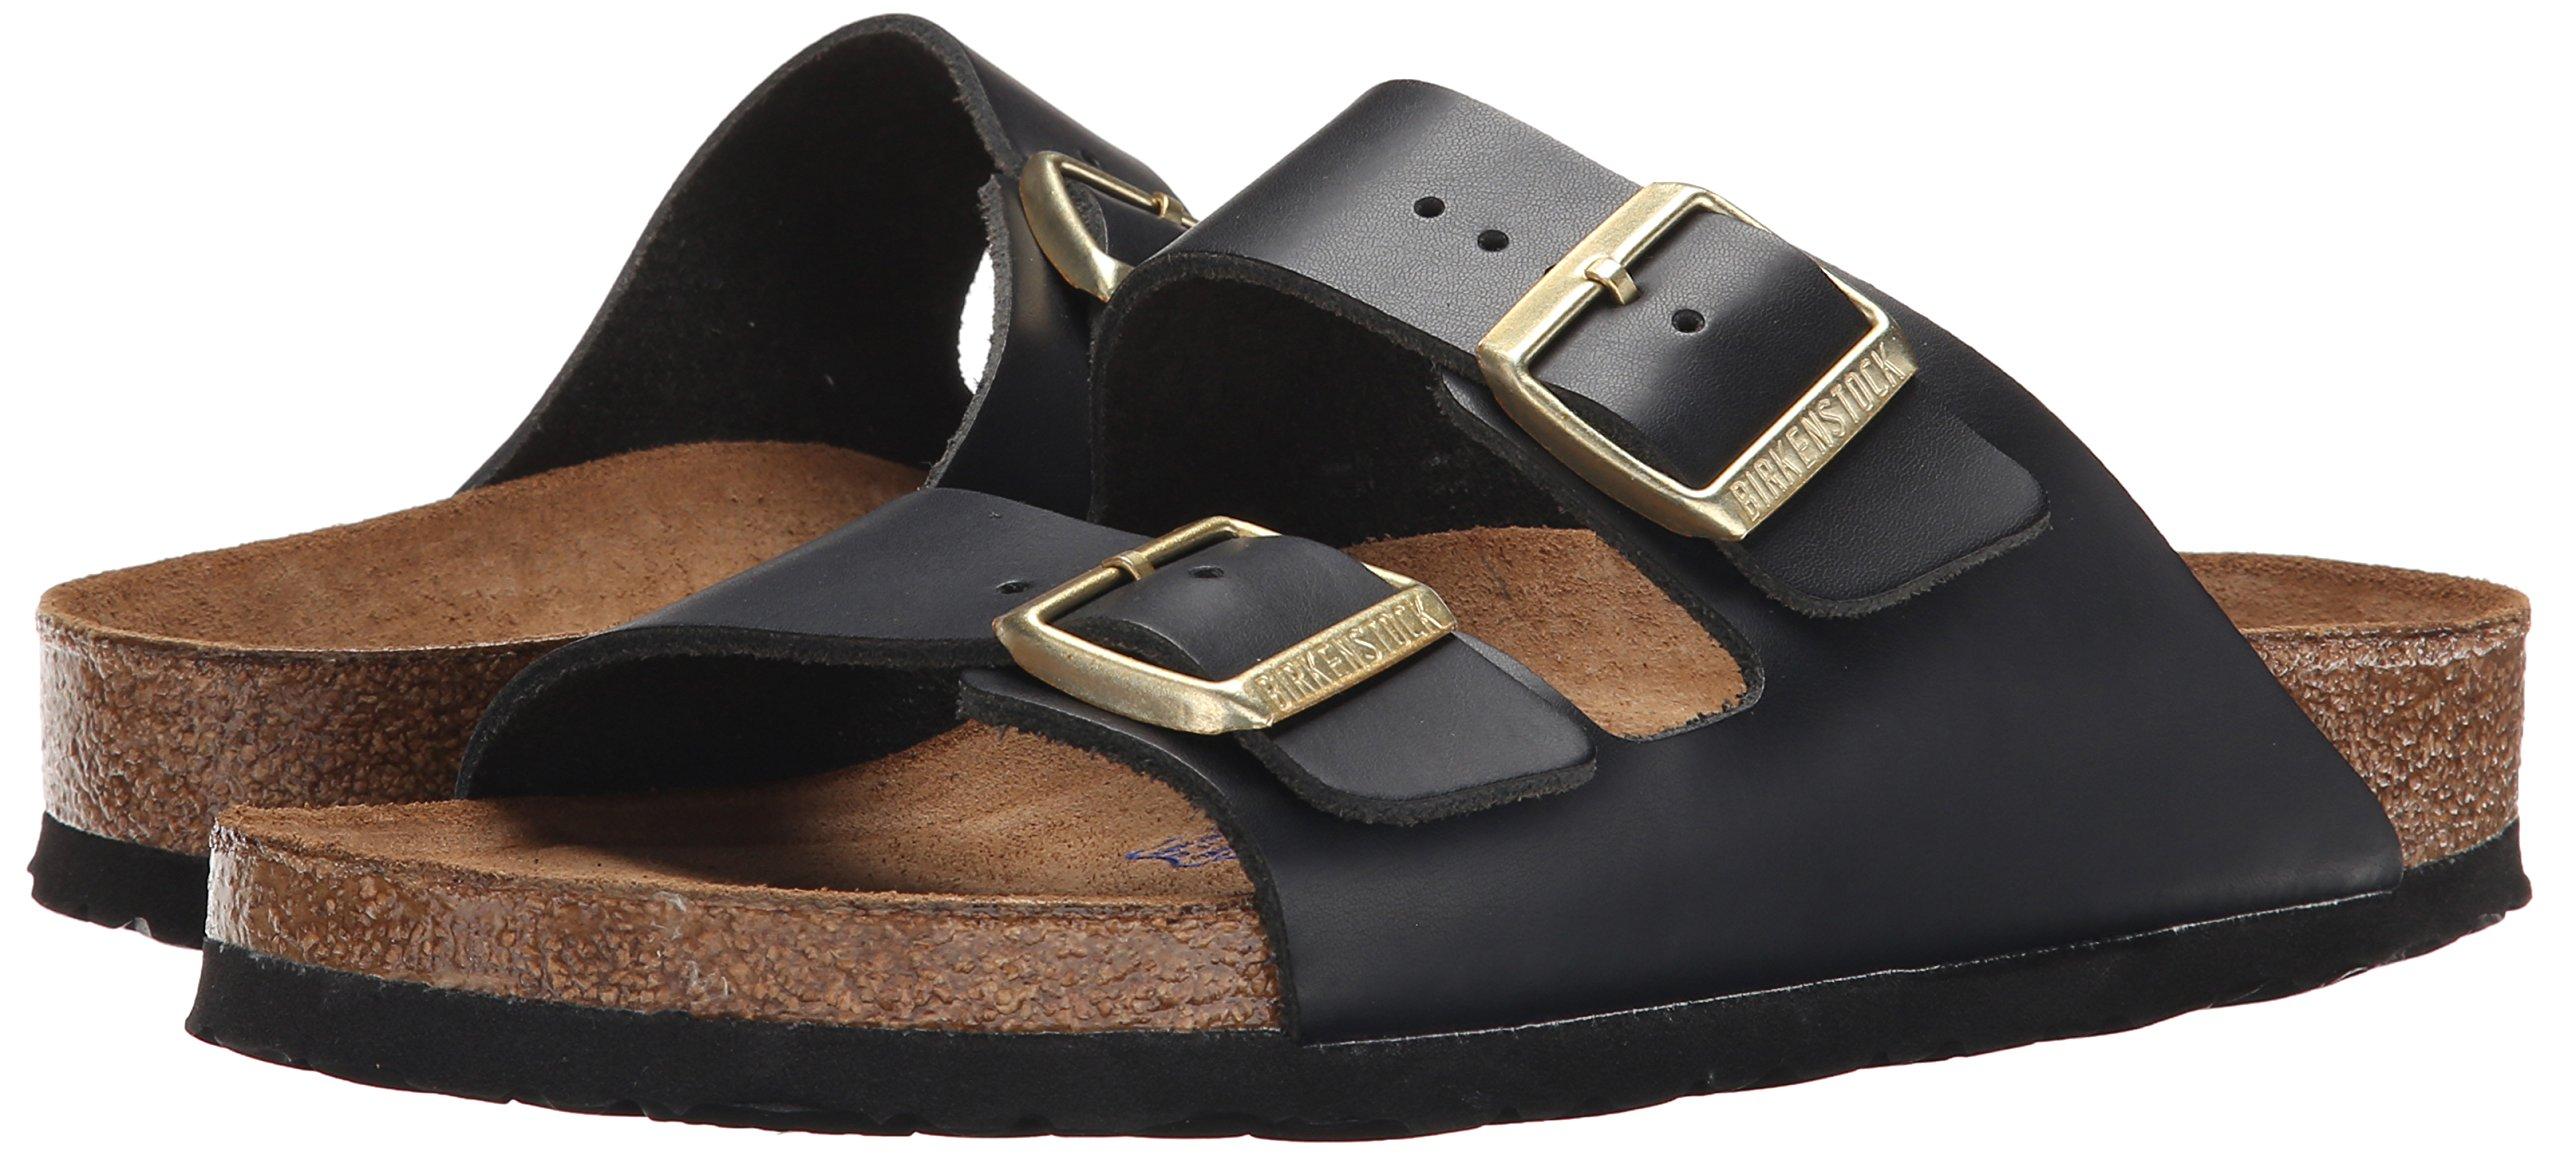 Birkenstock Unisex Arizona Hunter Black Leather Sandals - 9-9.5 2A(N) US Women/7-7.5 2A(N) US Men by Birkenstock (Image #6)